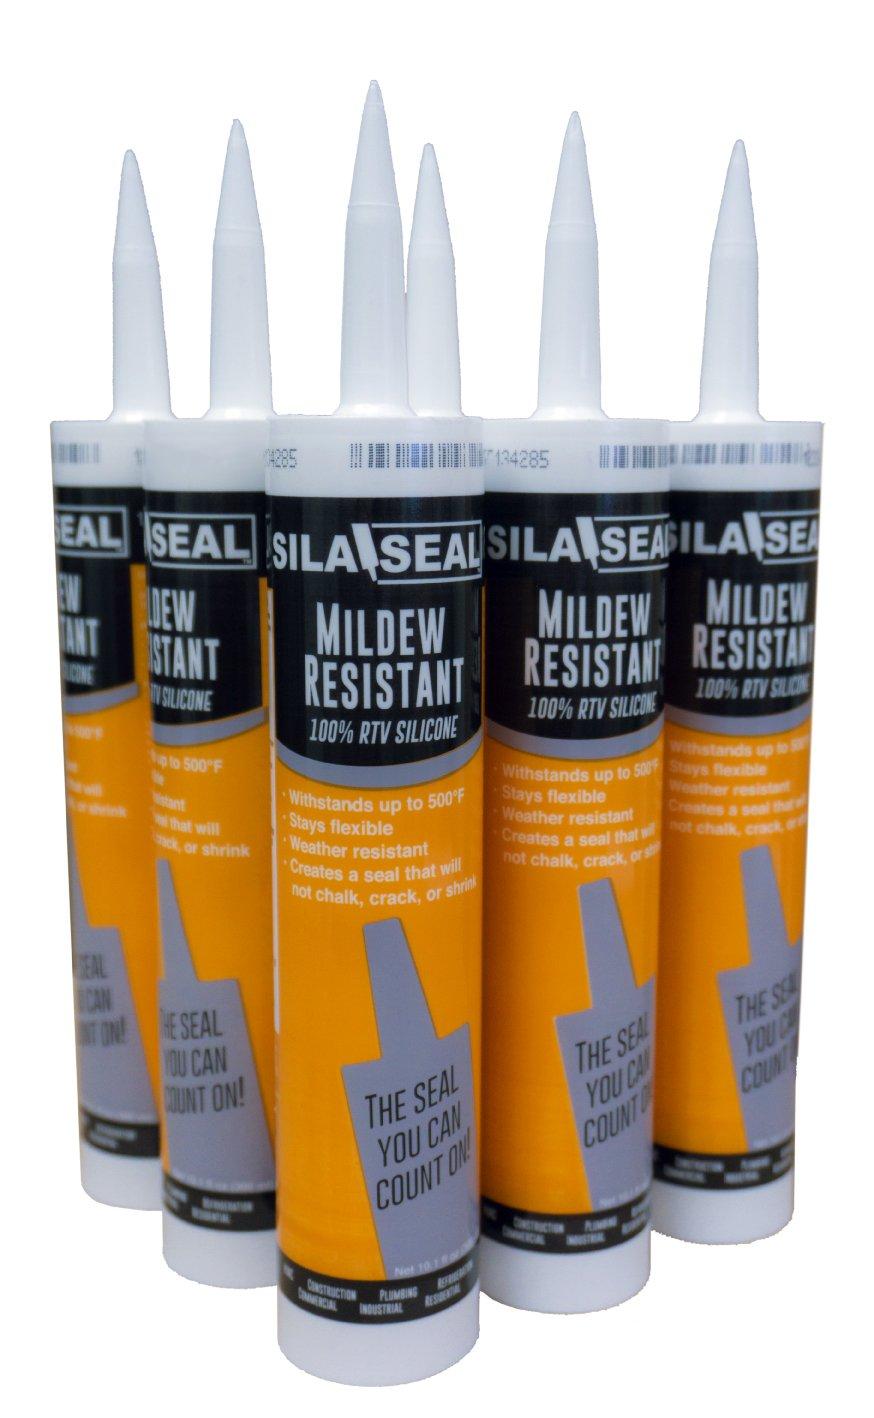 SILA-SEAL Mildew Resistant 100% RTV Silicone, (case of 6), White